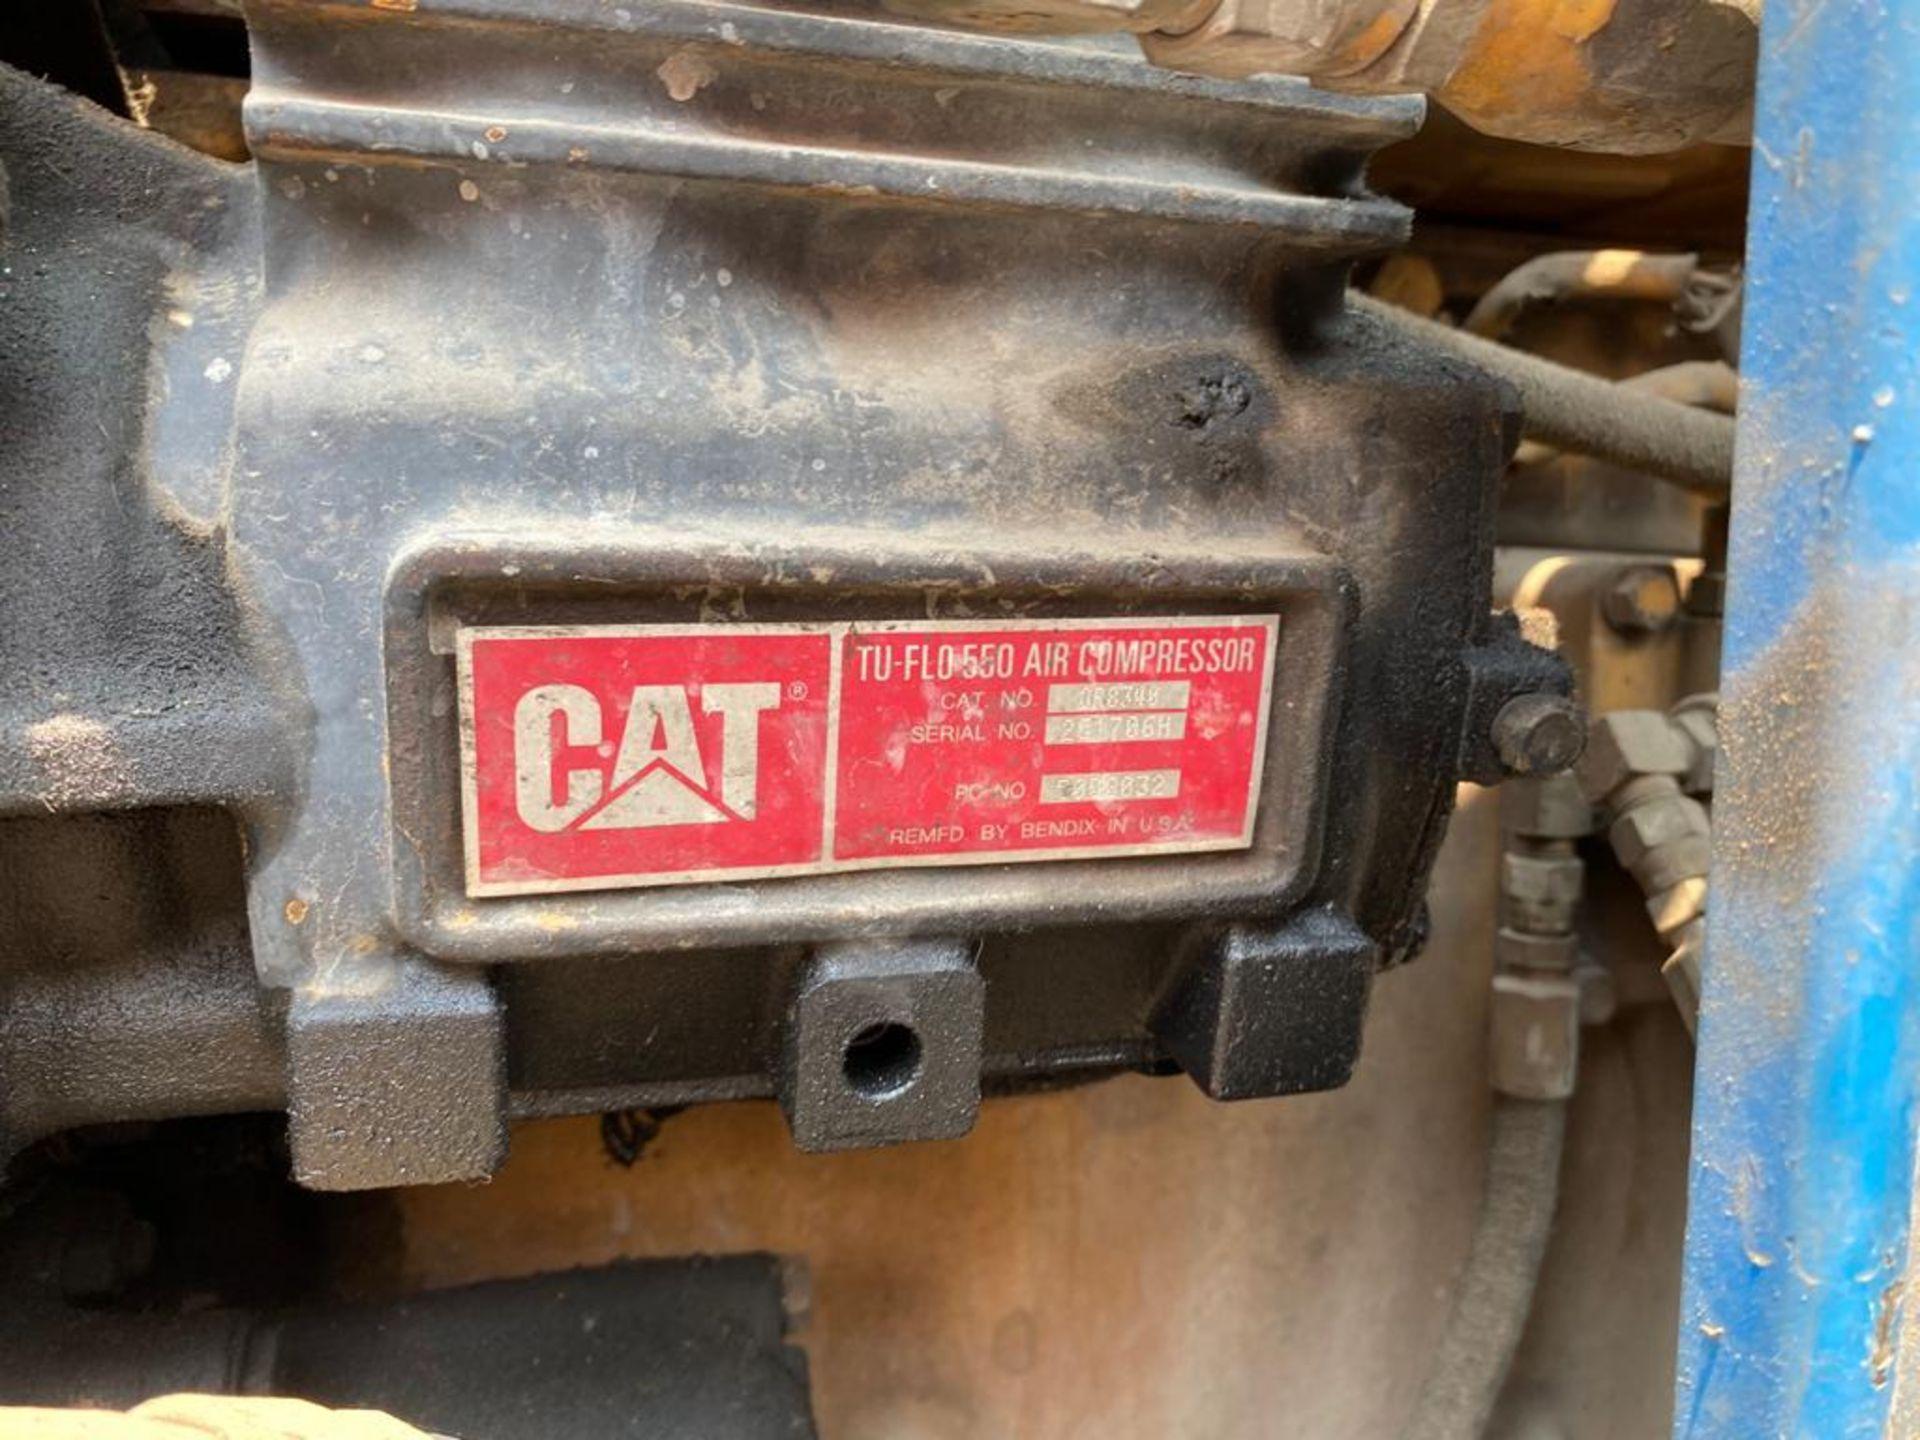 1999 Kenworth Sleeper truck tractor, standard transmission of 18 speeds - Image 52 of 70